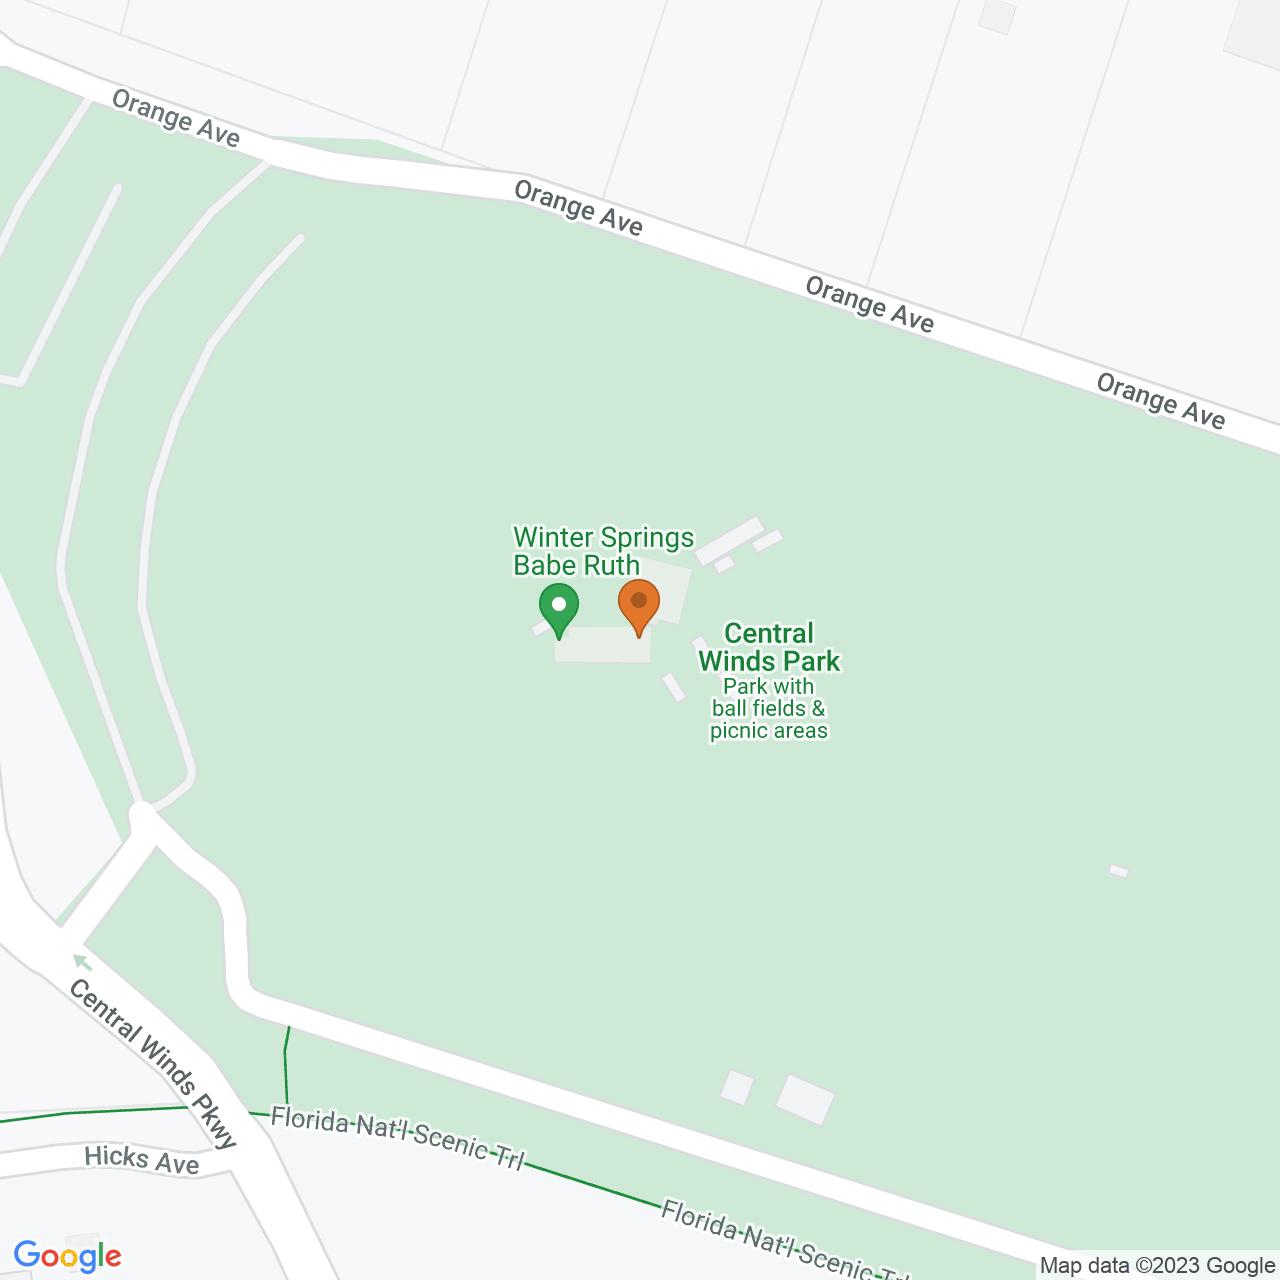 Central Winds Park